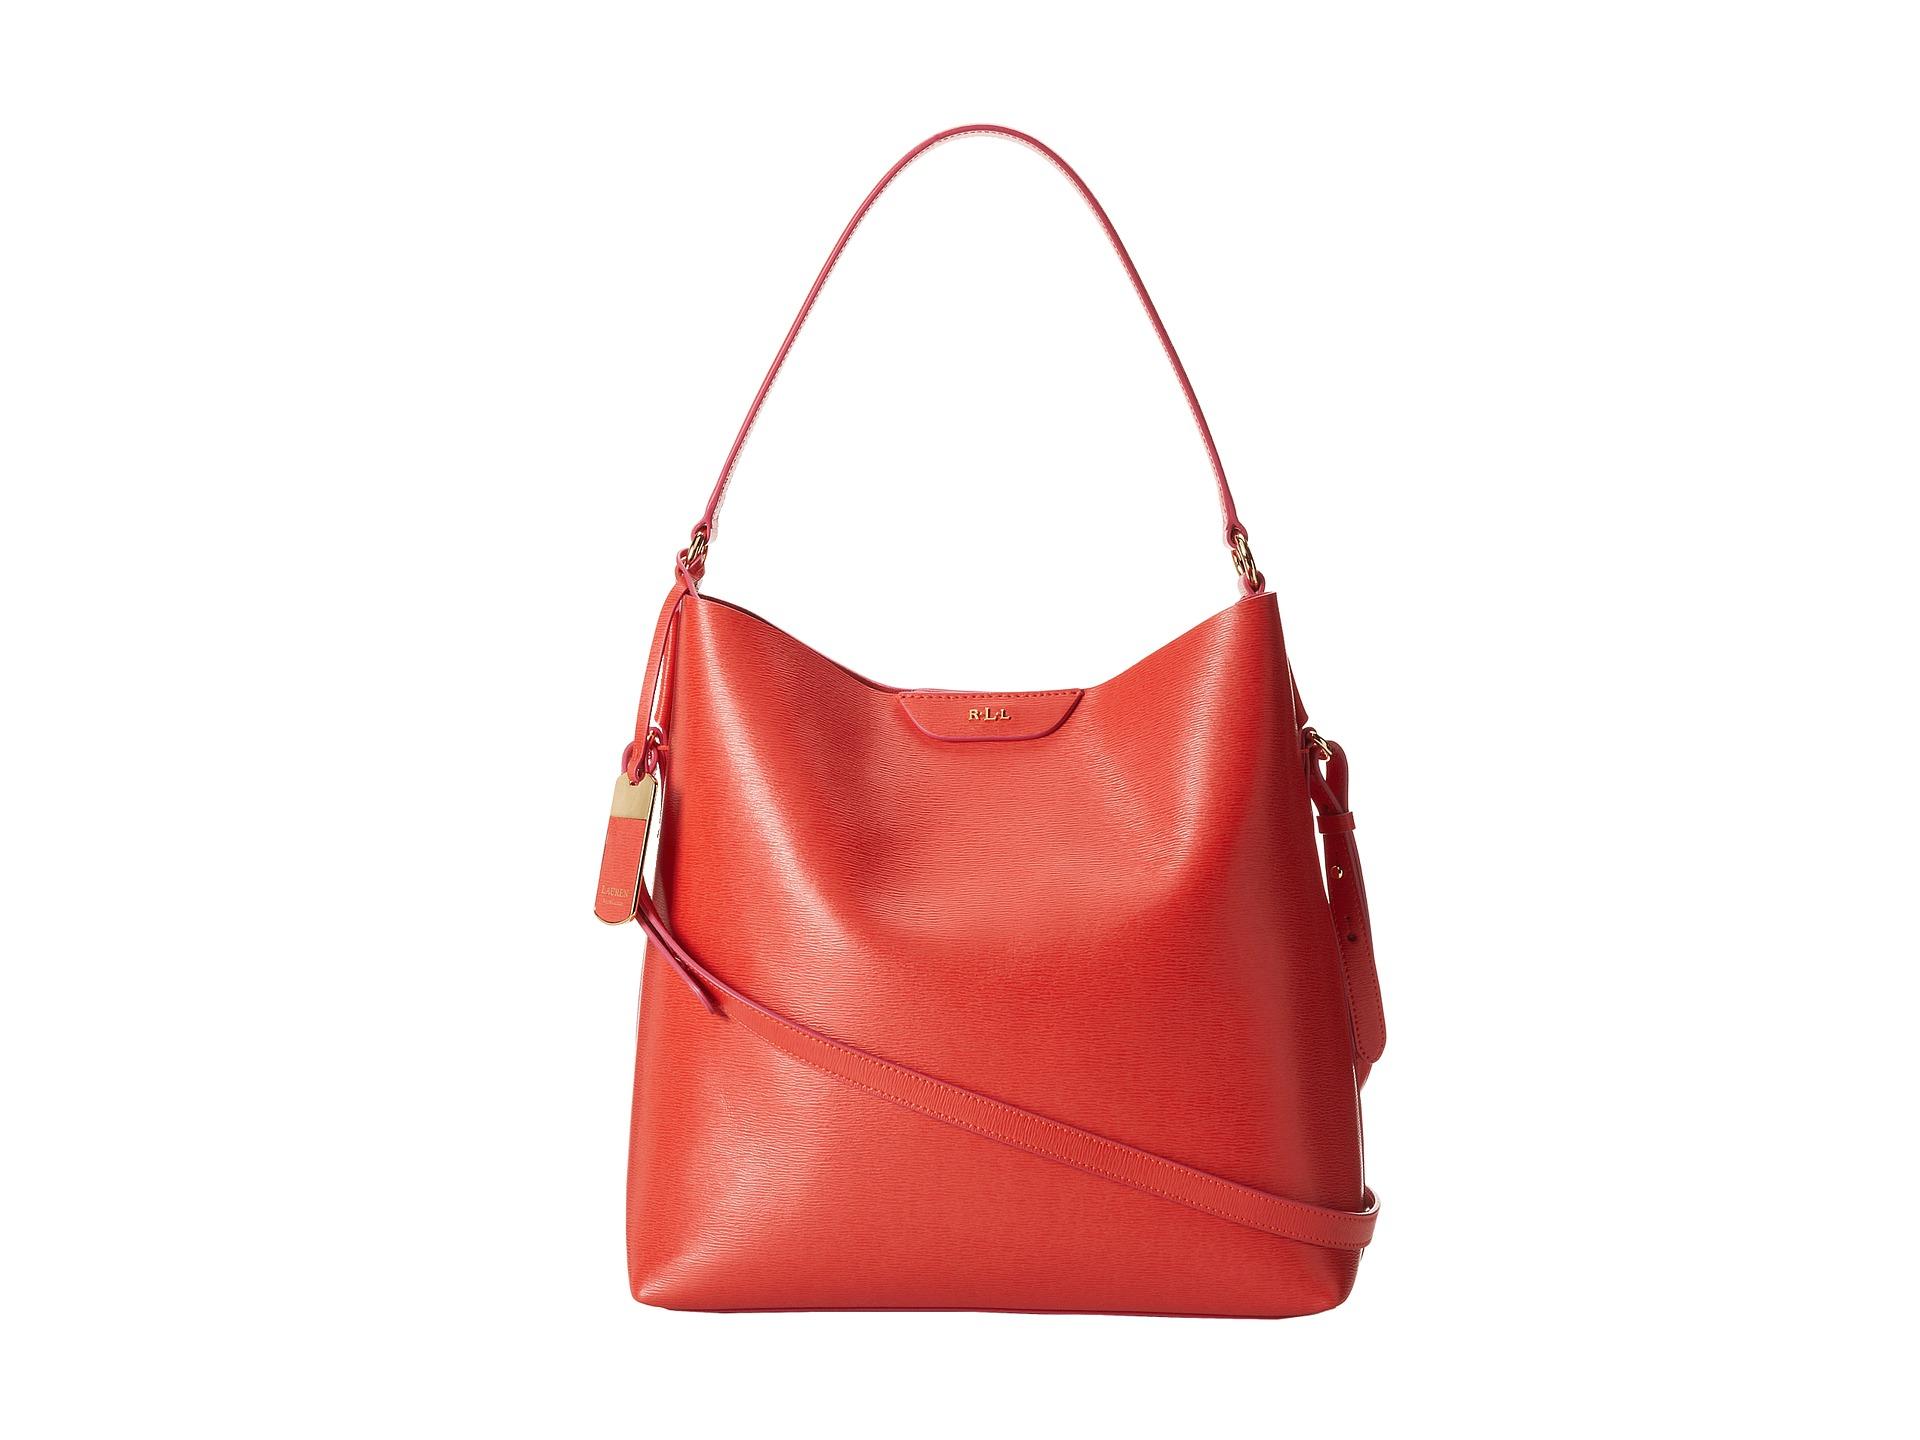 b35b60e05d9b Lyst - Lauren by Ralph Lauren Tate Hobo in Red